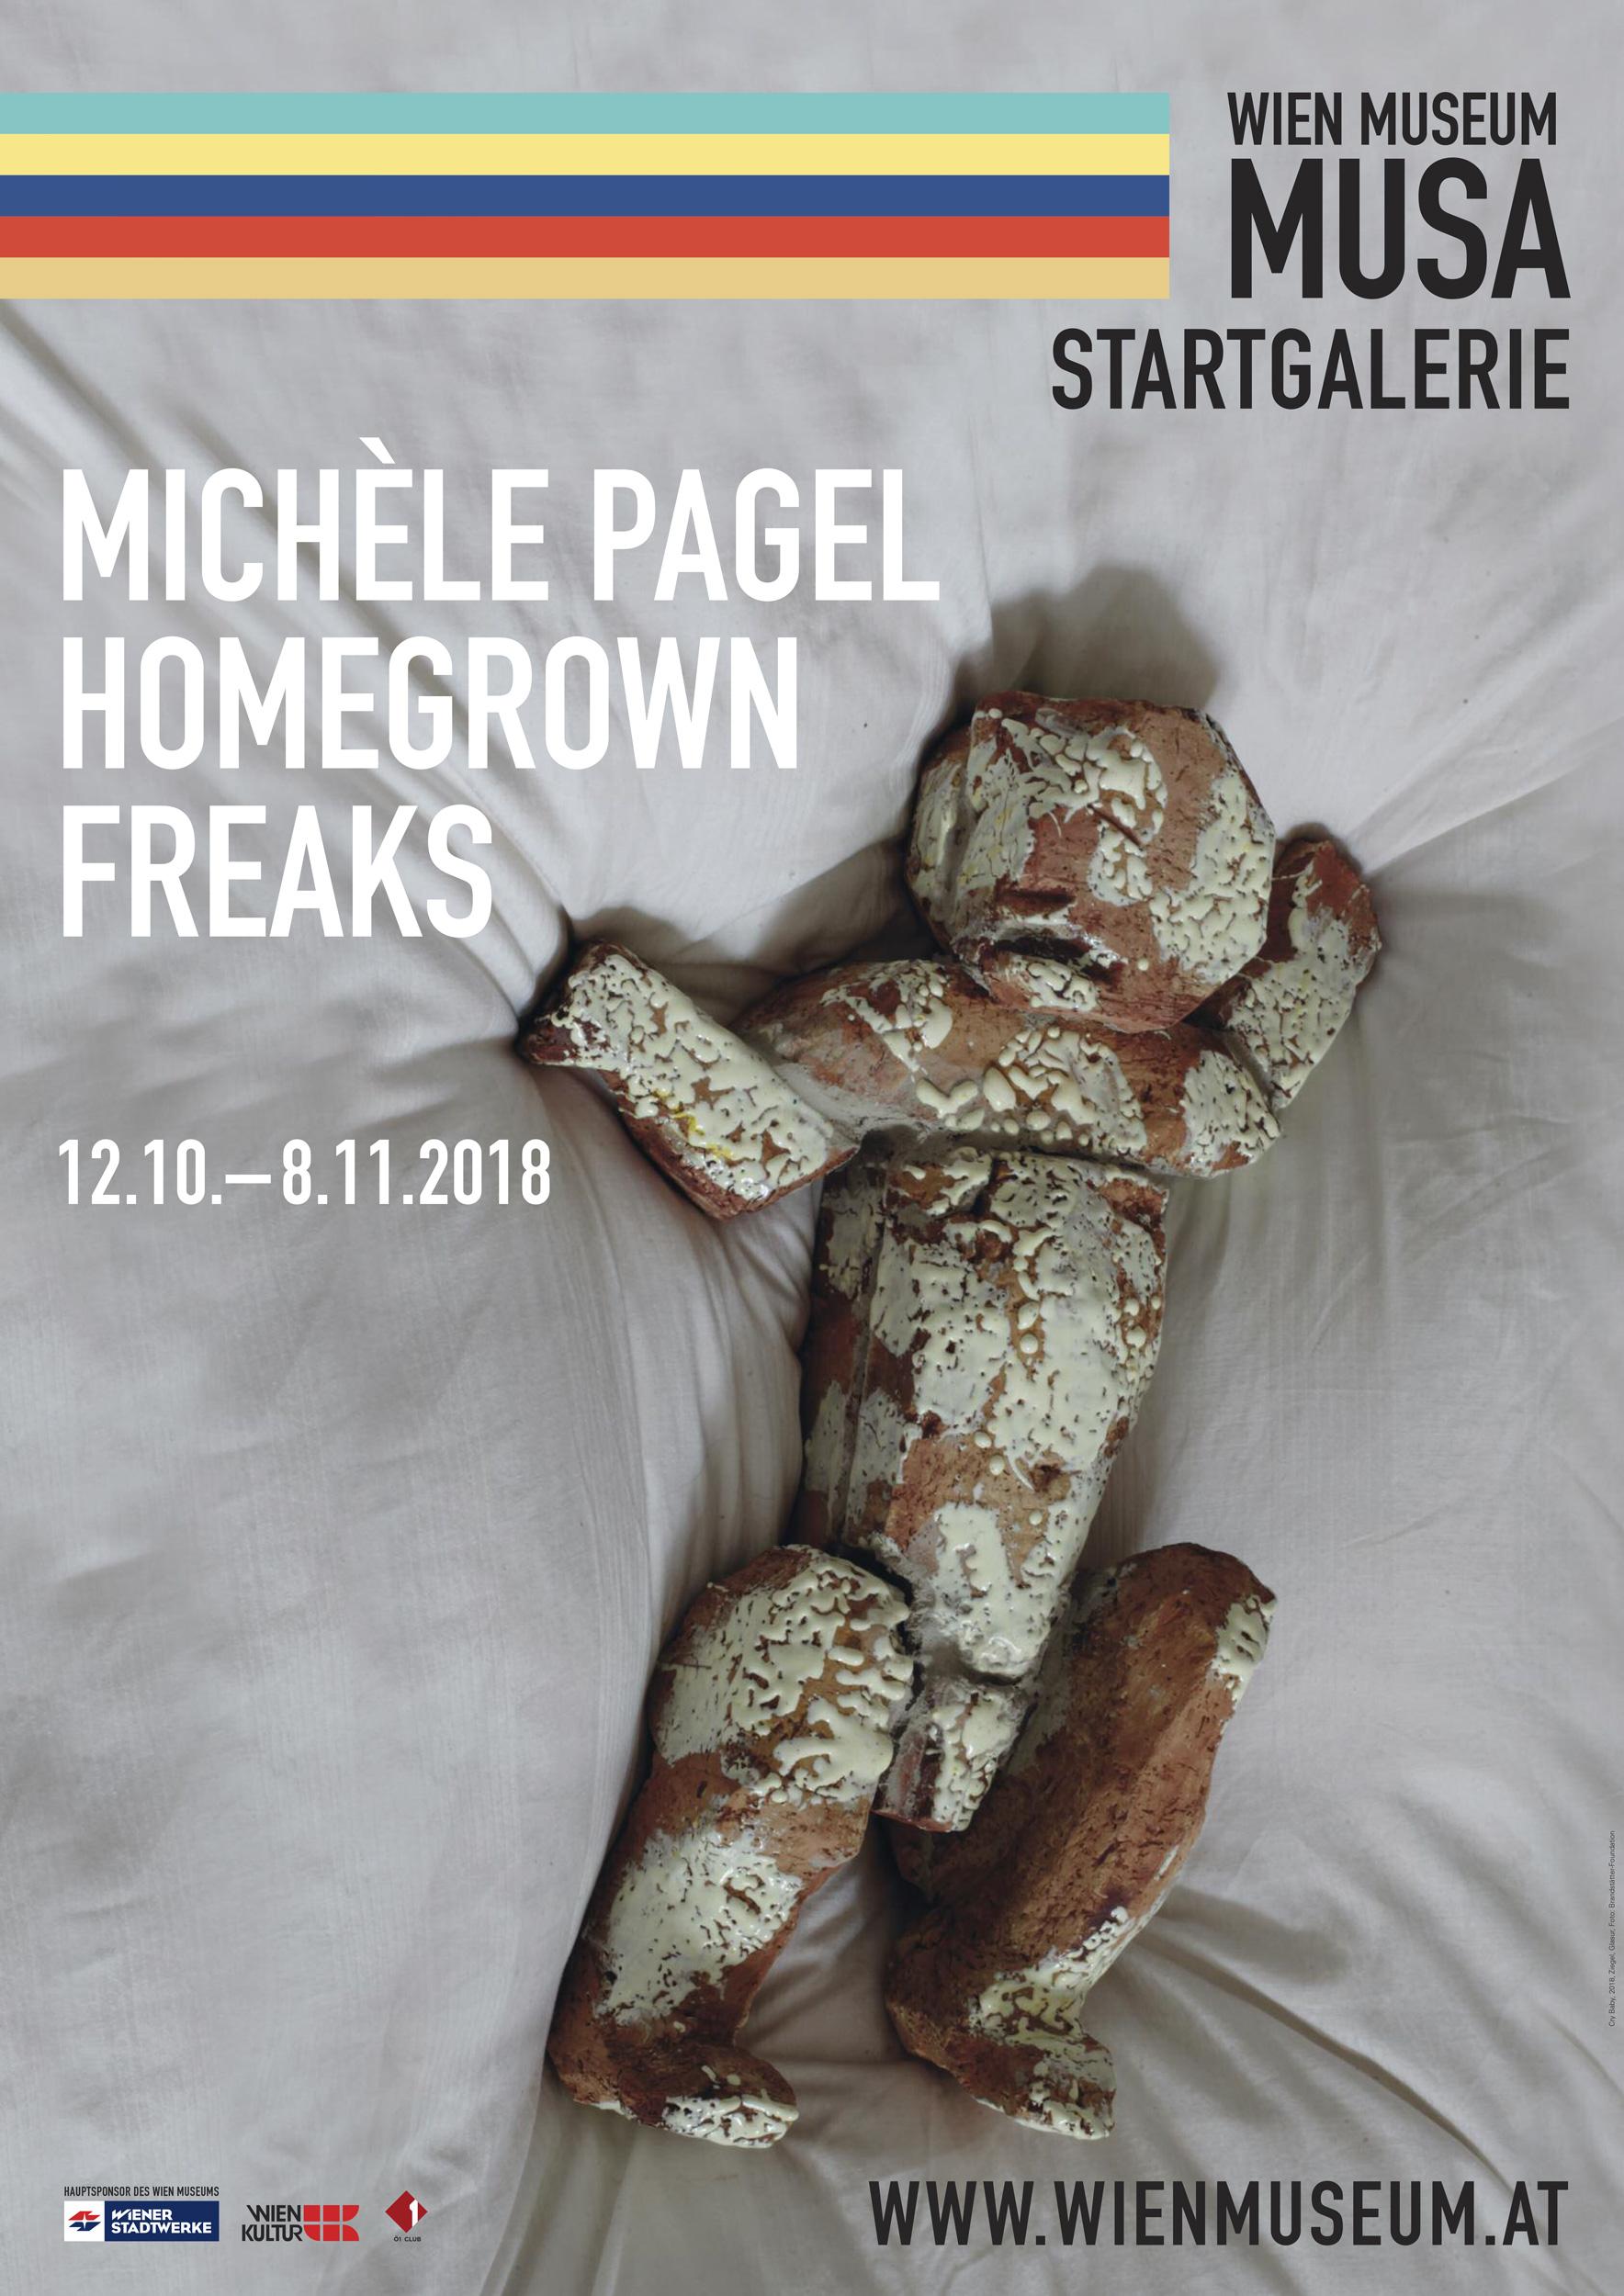 Michele Pagel Homegrown Freaks